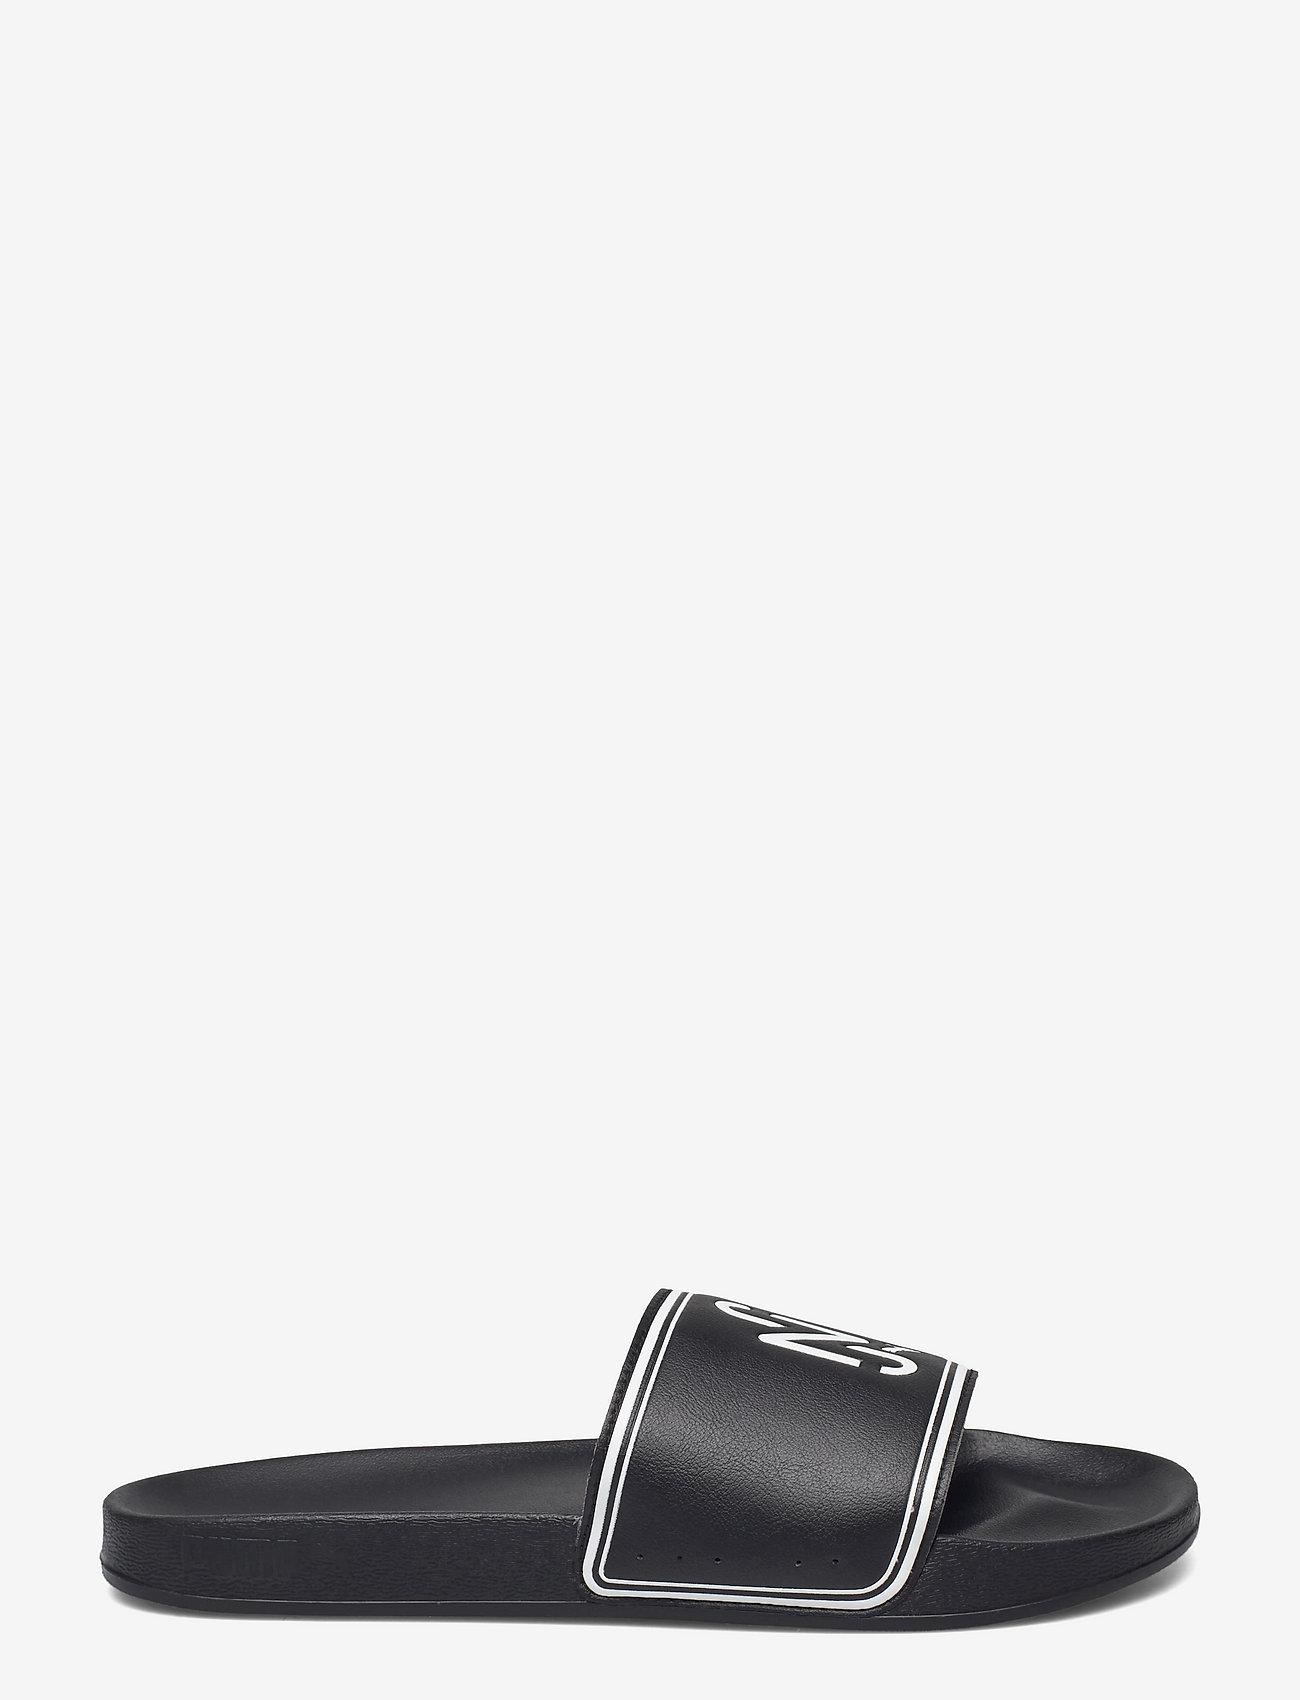 PUMA - Leadcat FTR NJR - shoes - puma black-puma white - 1